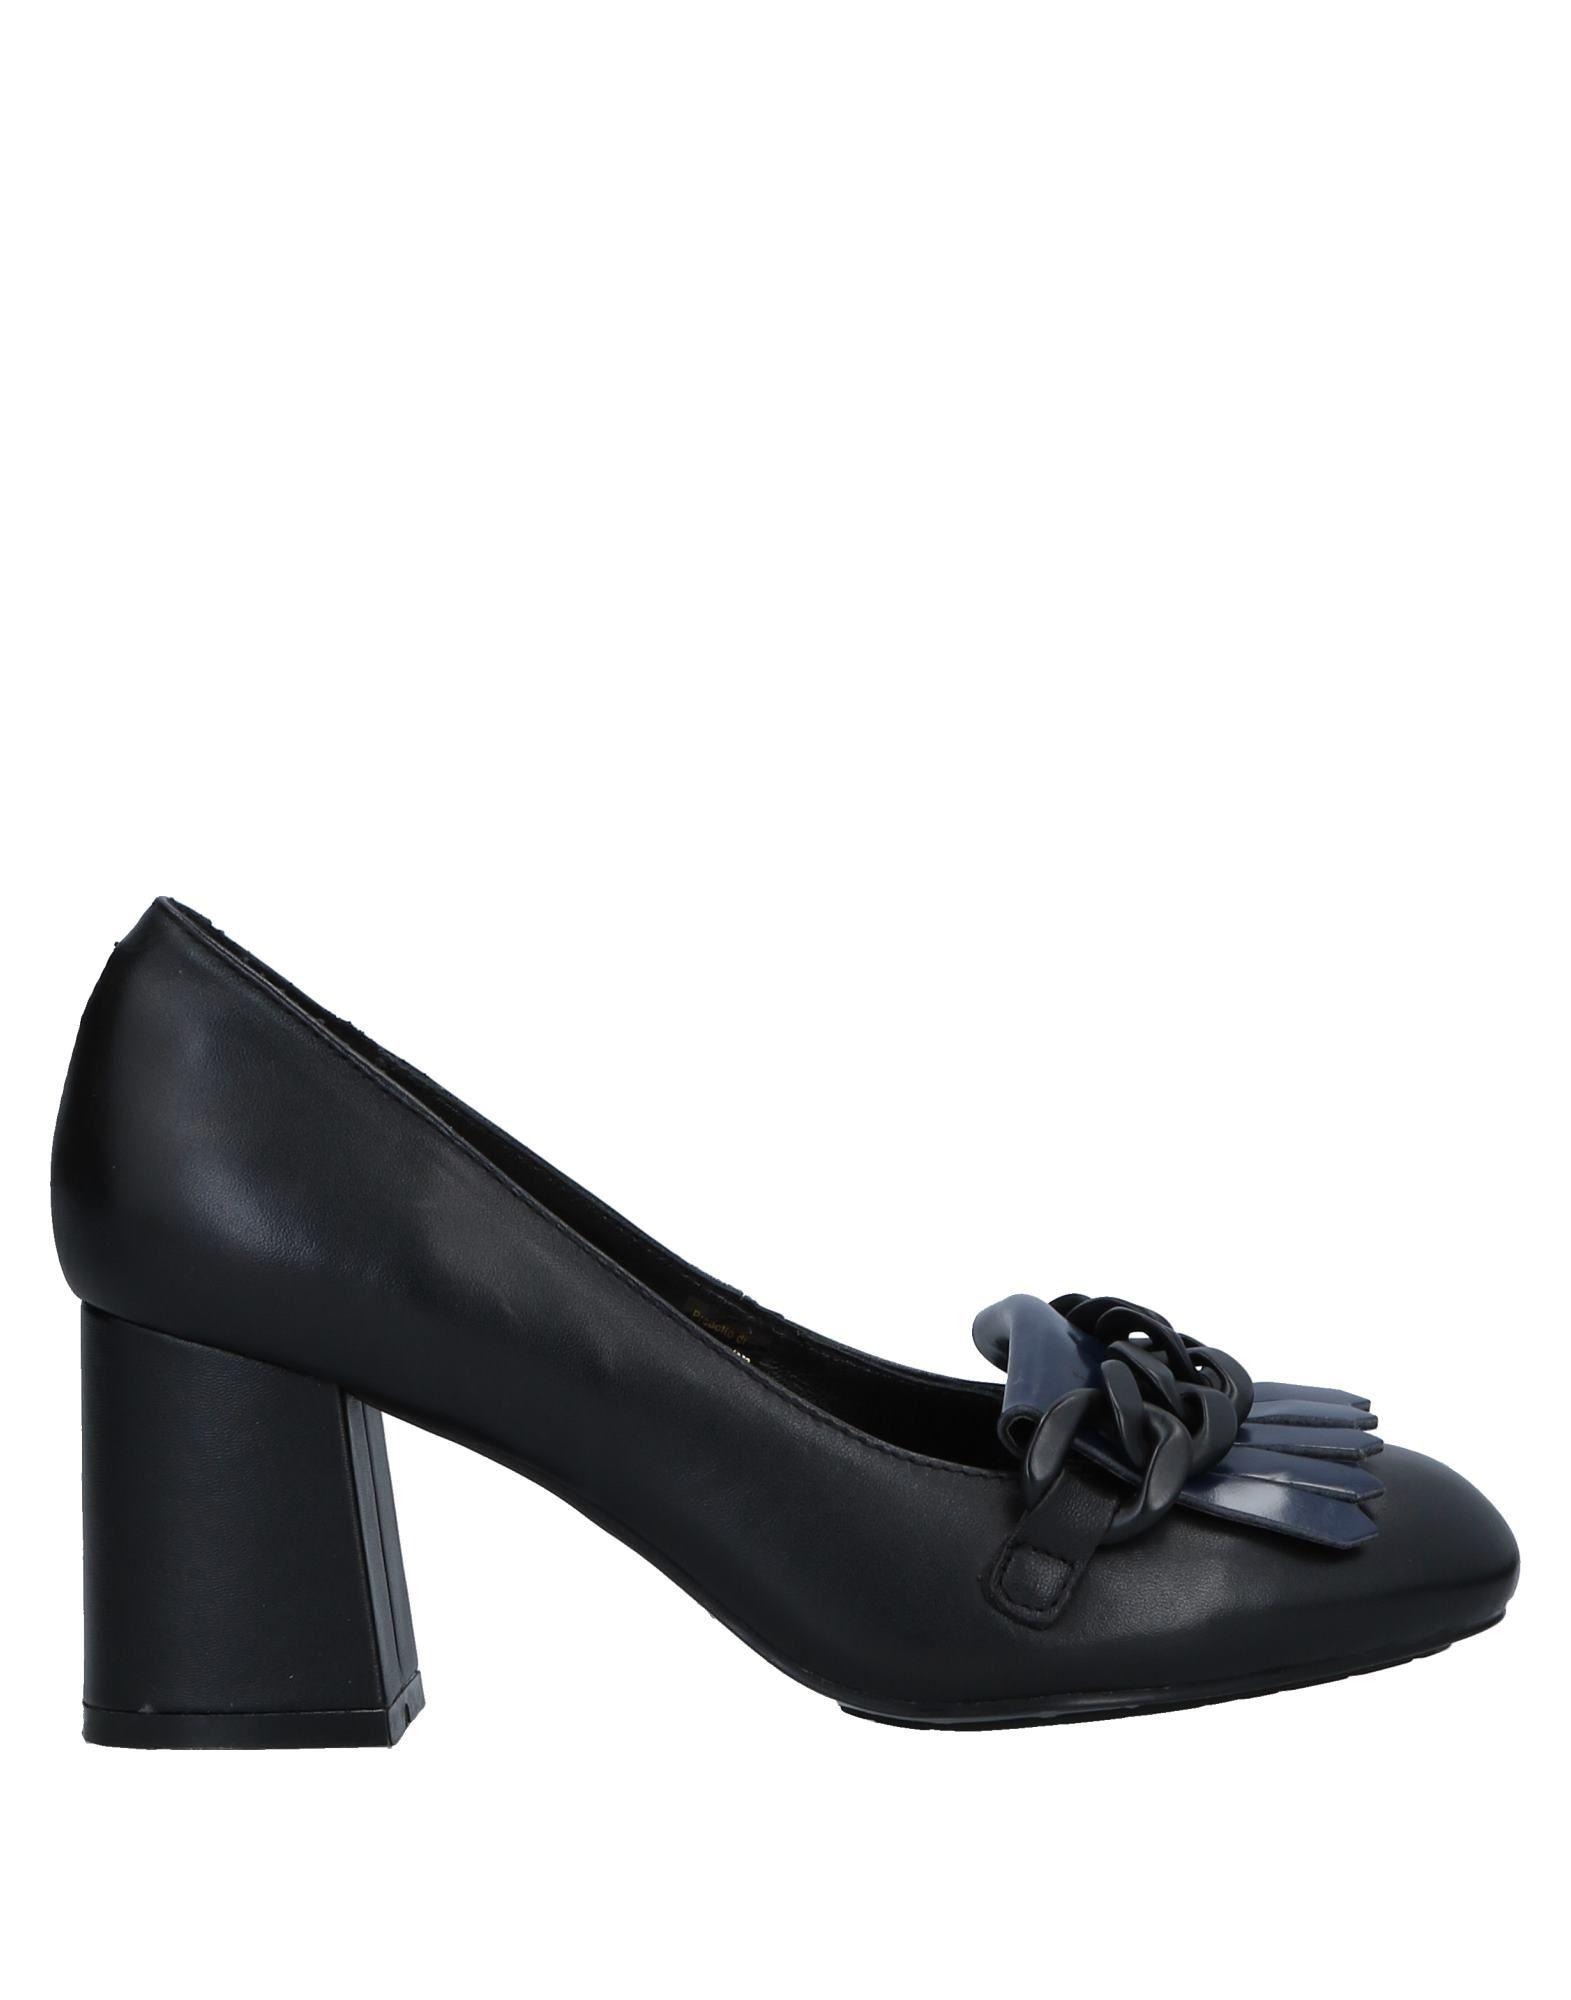 Sandali Vidorreta Donna - scarpe 11504403HT Nuove offerte e scarpe - comode 632b6a